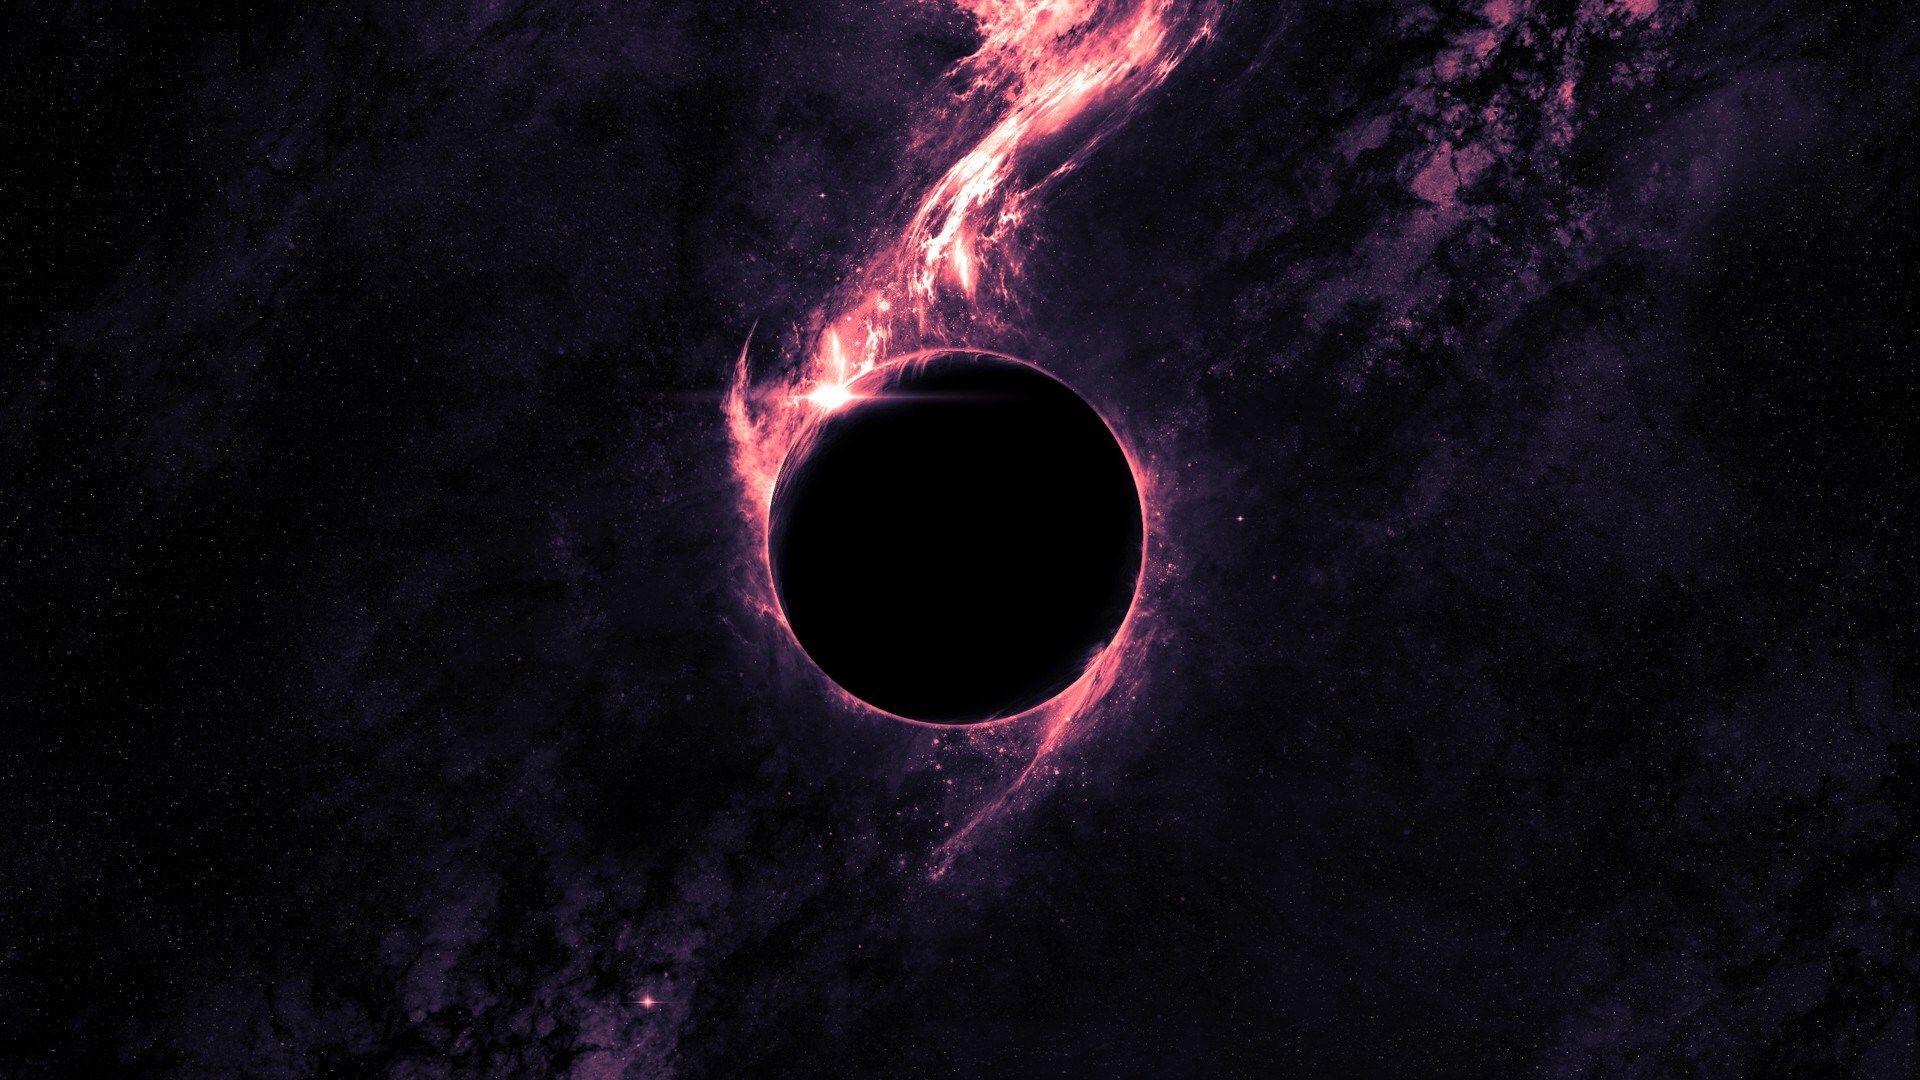 3d Space Black Hole Amazing Hd Wallpaper Black Hole